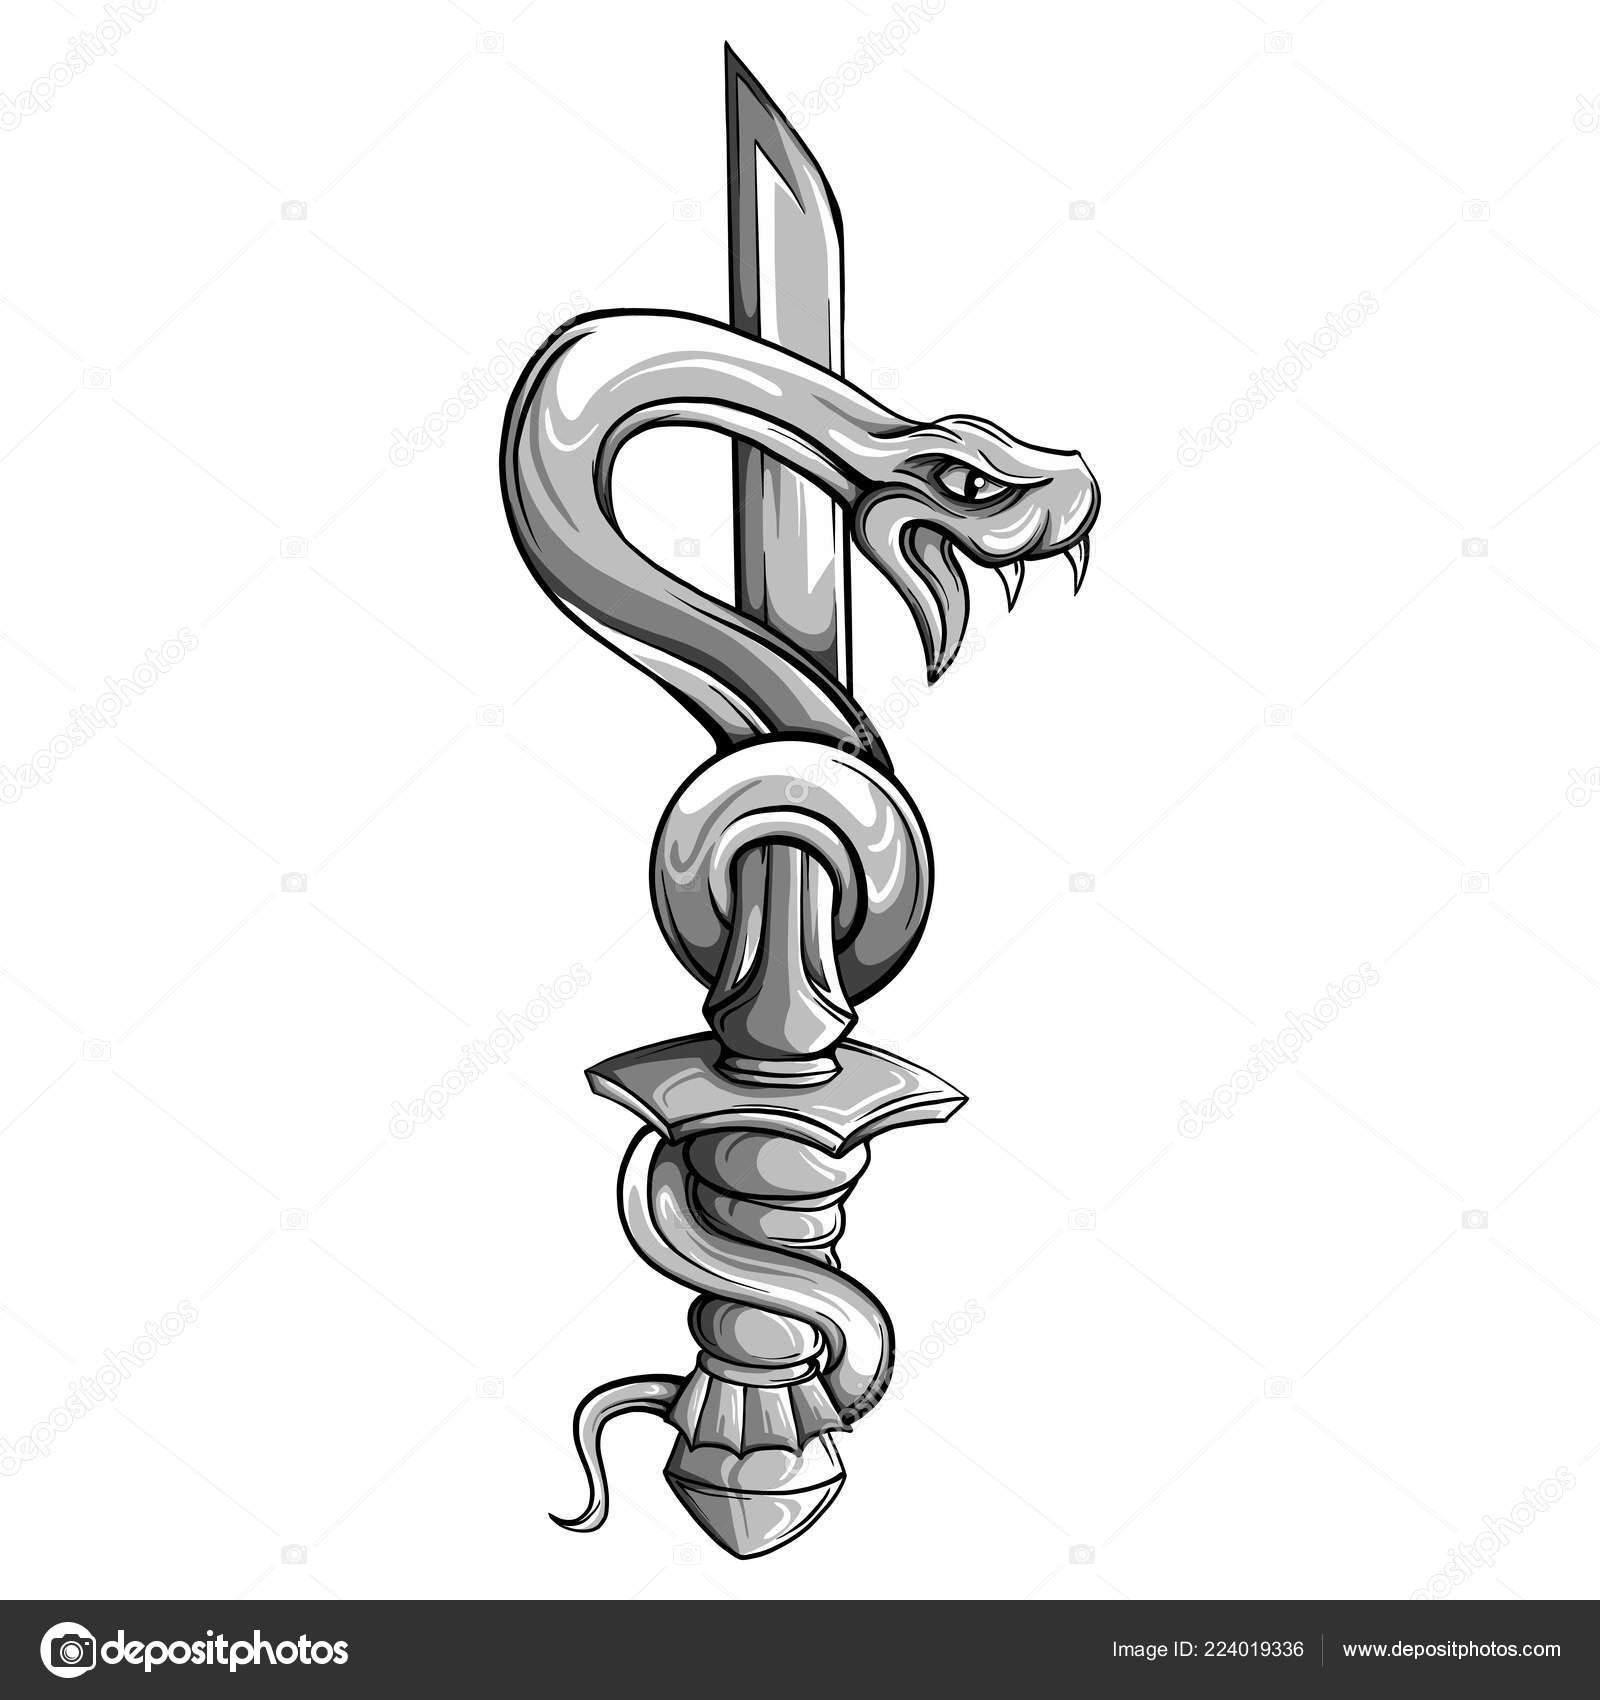 Sztylet Tatuaż Wektor Węża Sztylet Urządzone Dużym Szafiru